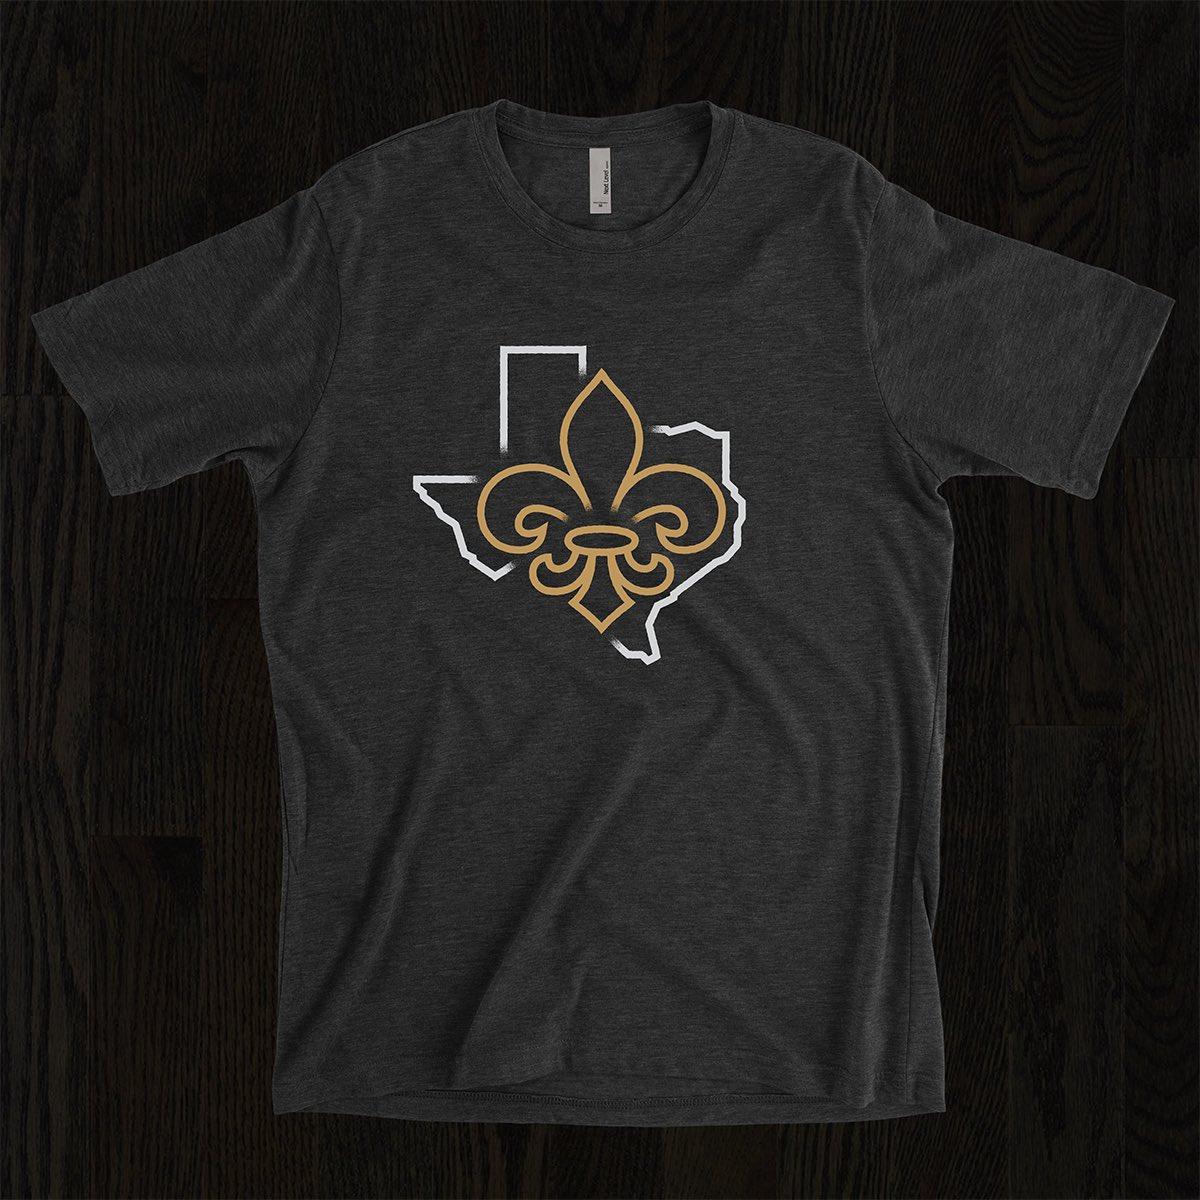 This shirt donates to the @HoustonFoodBank -- https://t.co/eM7IHkRpsT https://t.co/uhEP6aYsEa